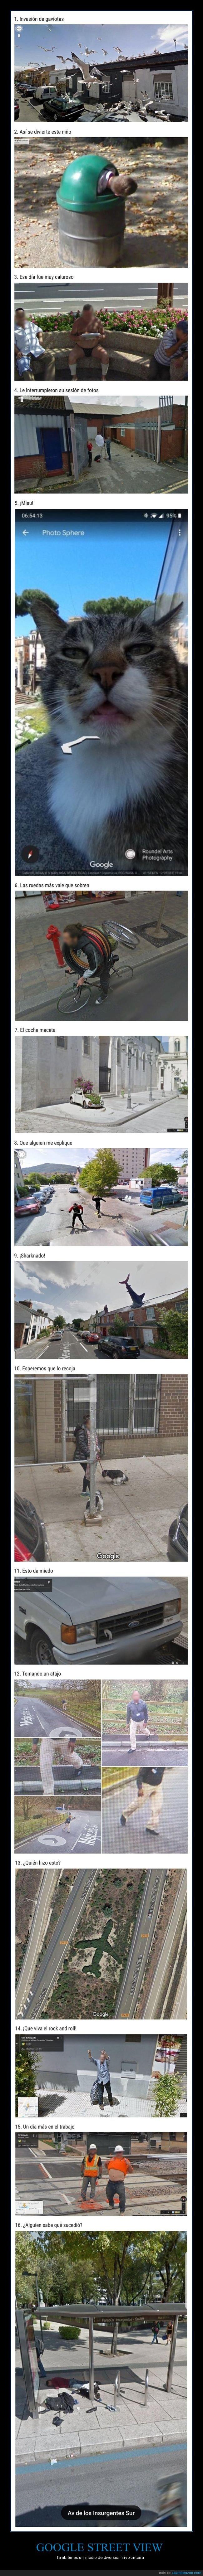 google,street view,wtf